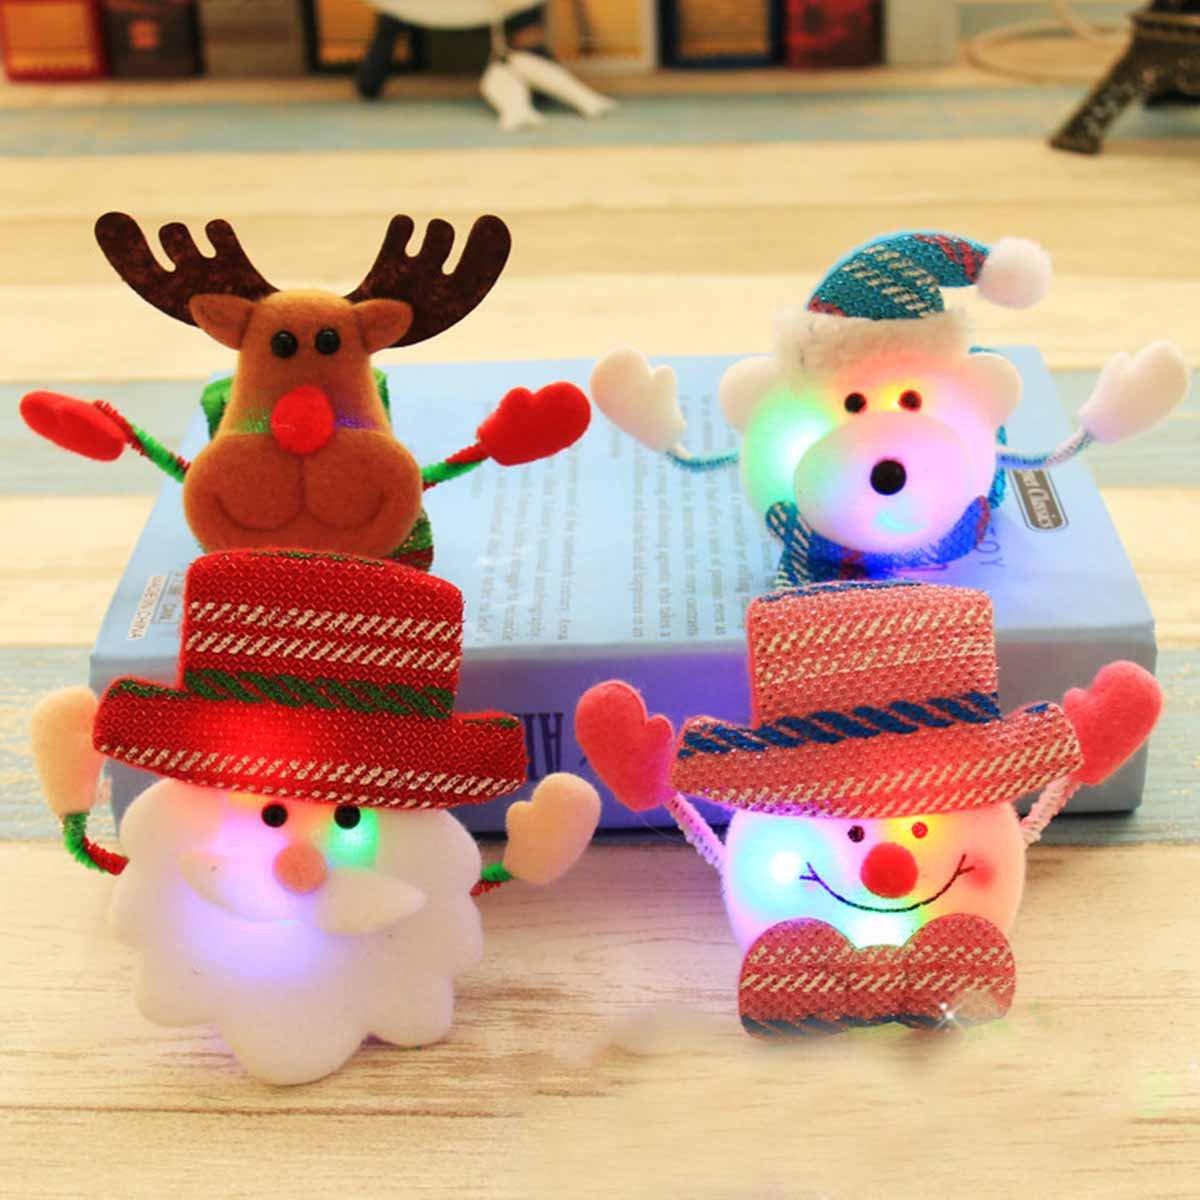 YeahiBaby Santa Claus LED Glow Slap Bracelet Paillettes Wristband per Bambini Ragazzi Ragazze Adulti Compleanno Festa di Natale Favori